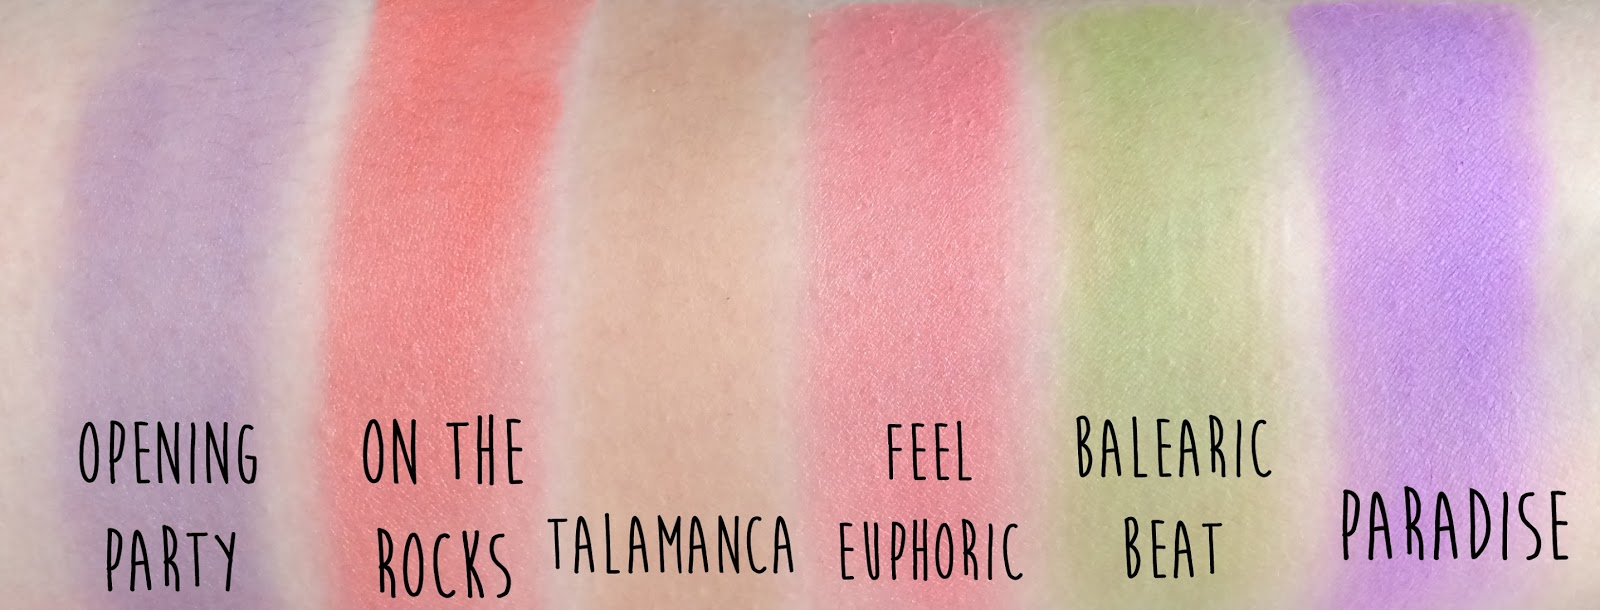 Sleek Del Mar Volume 1 limited edition eyeshadow palette